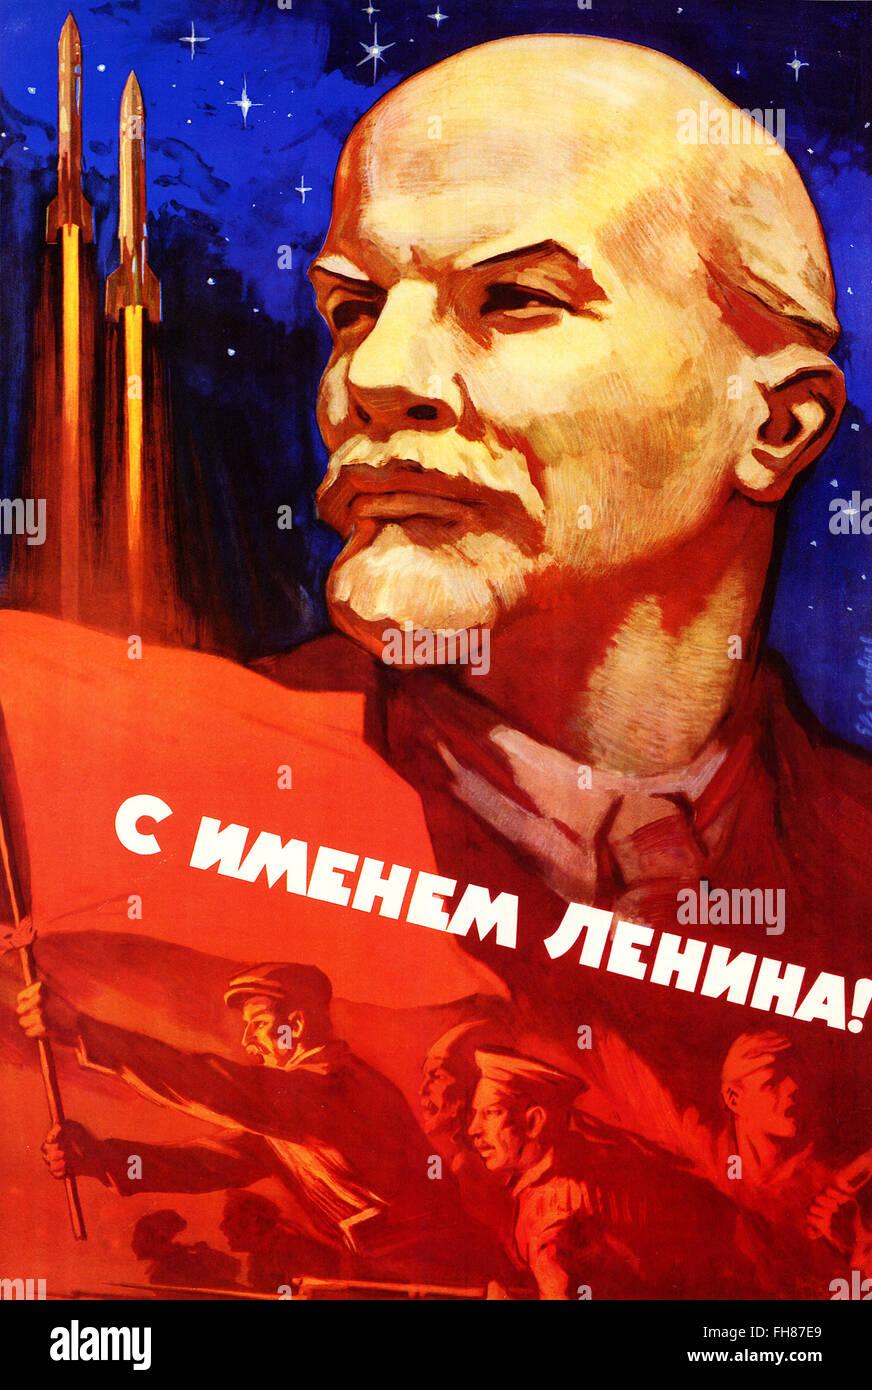 soviet space program propaganda poster - Lenine - Stock Image